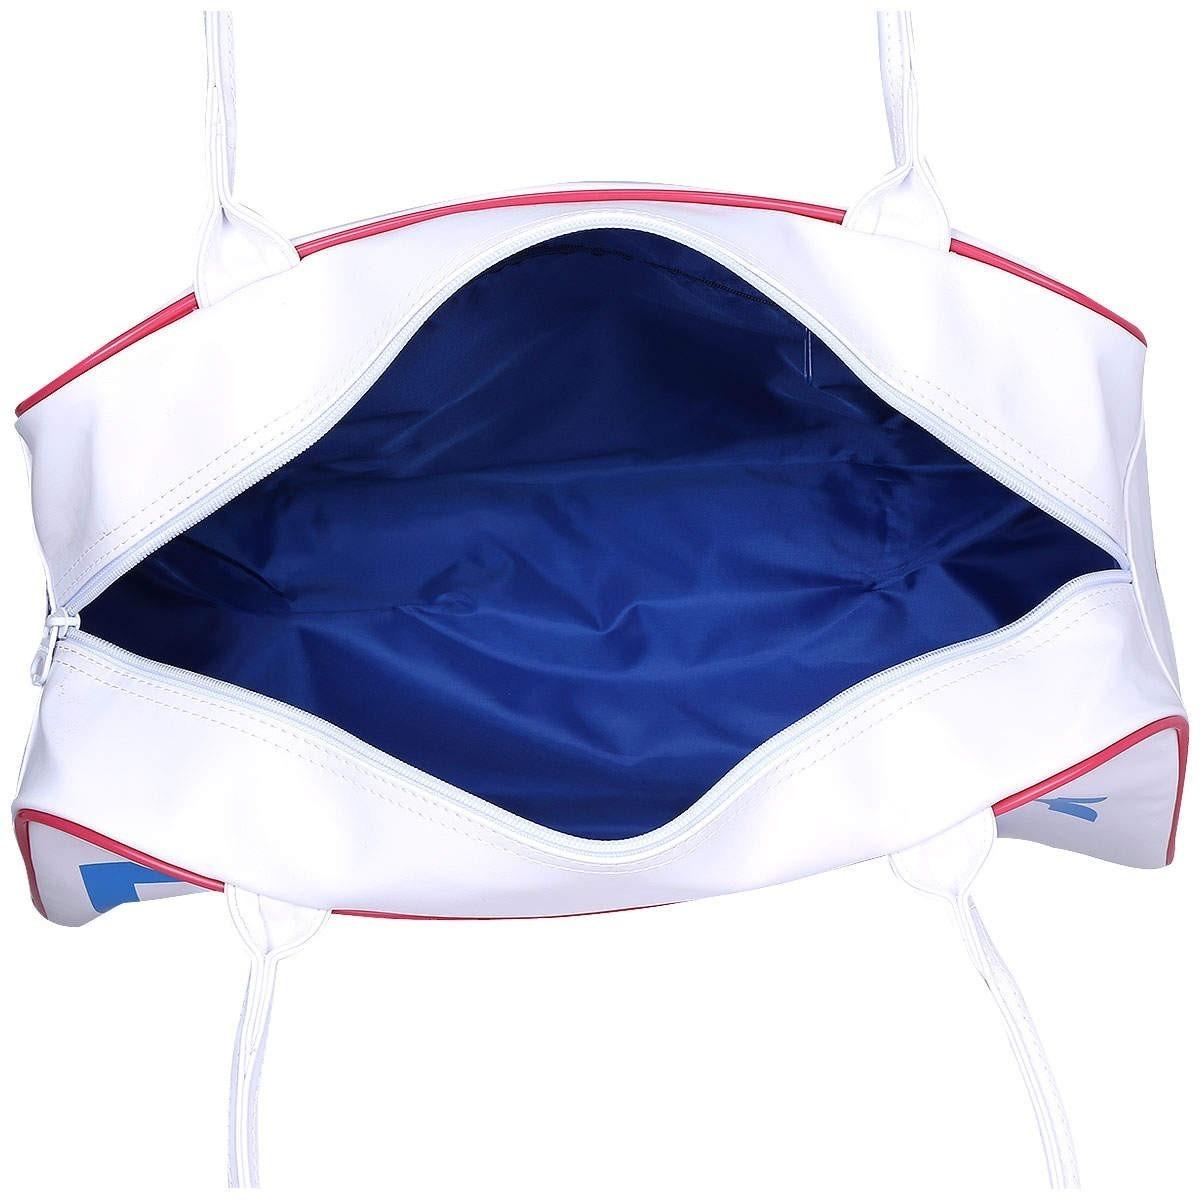 33645d2df Bolsa Reebok Duffle Cl Royal - Branco - R$ 89,00 em Mercado Livre